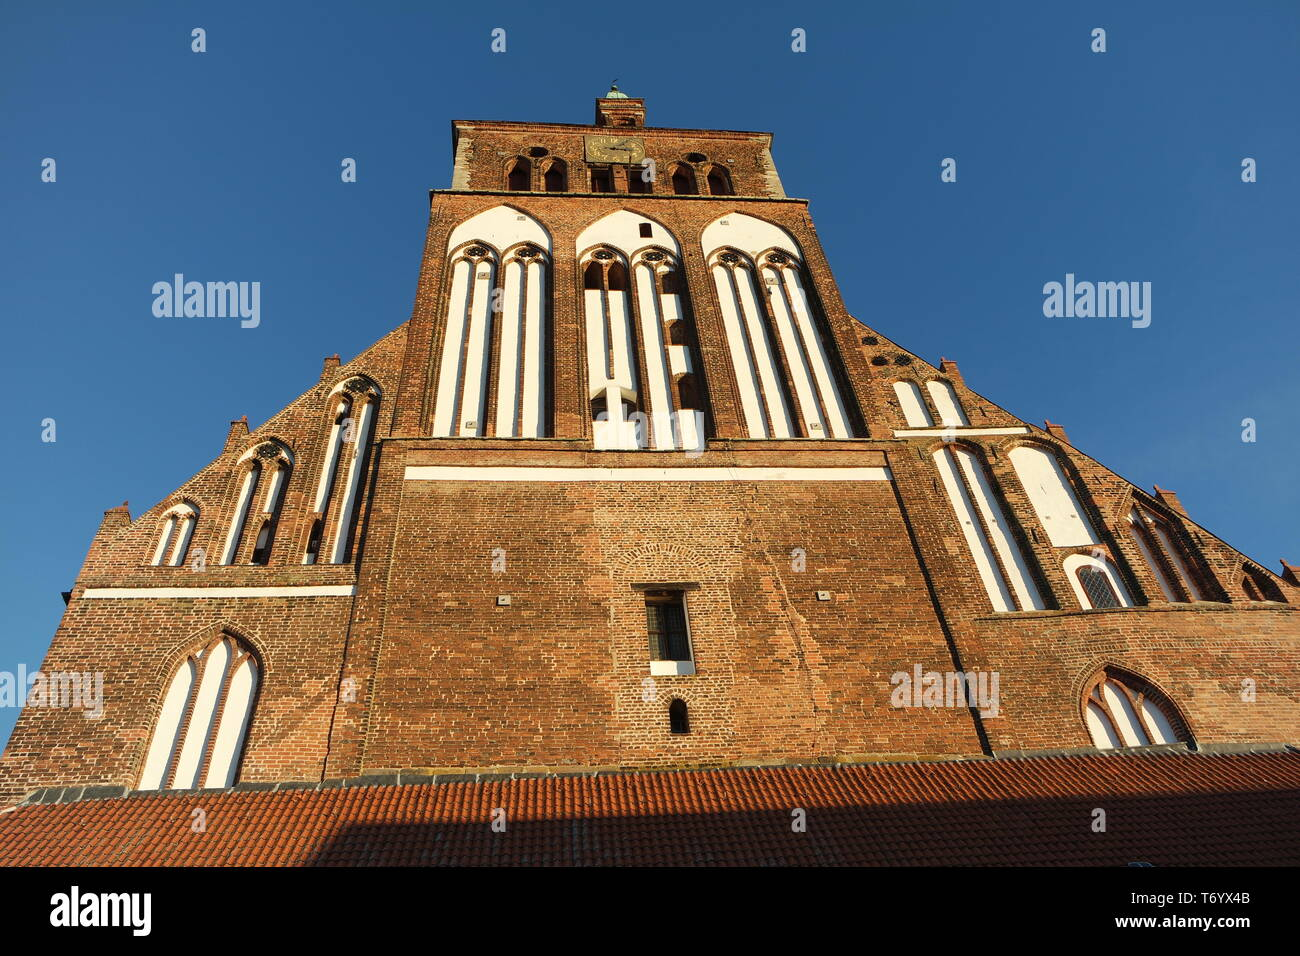 Brick Gothic, Marien church Greifswald - Stock Image